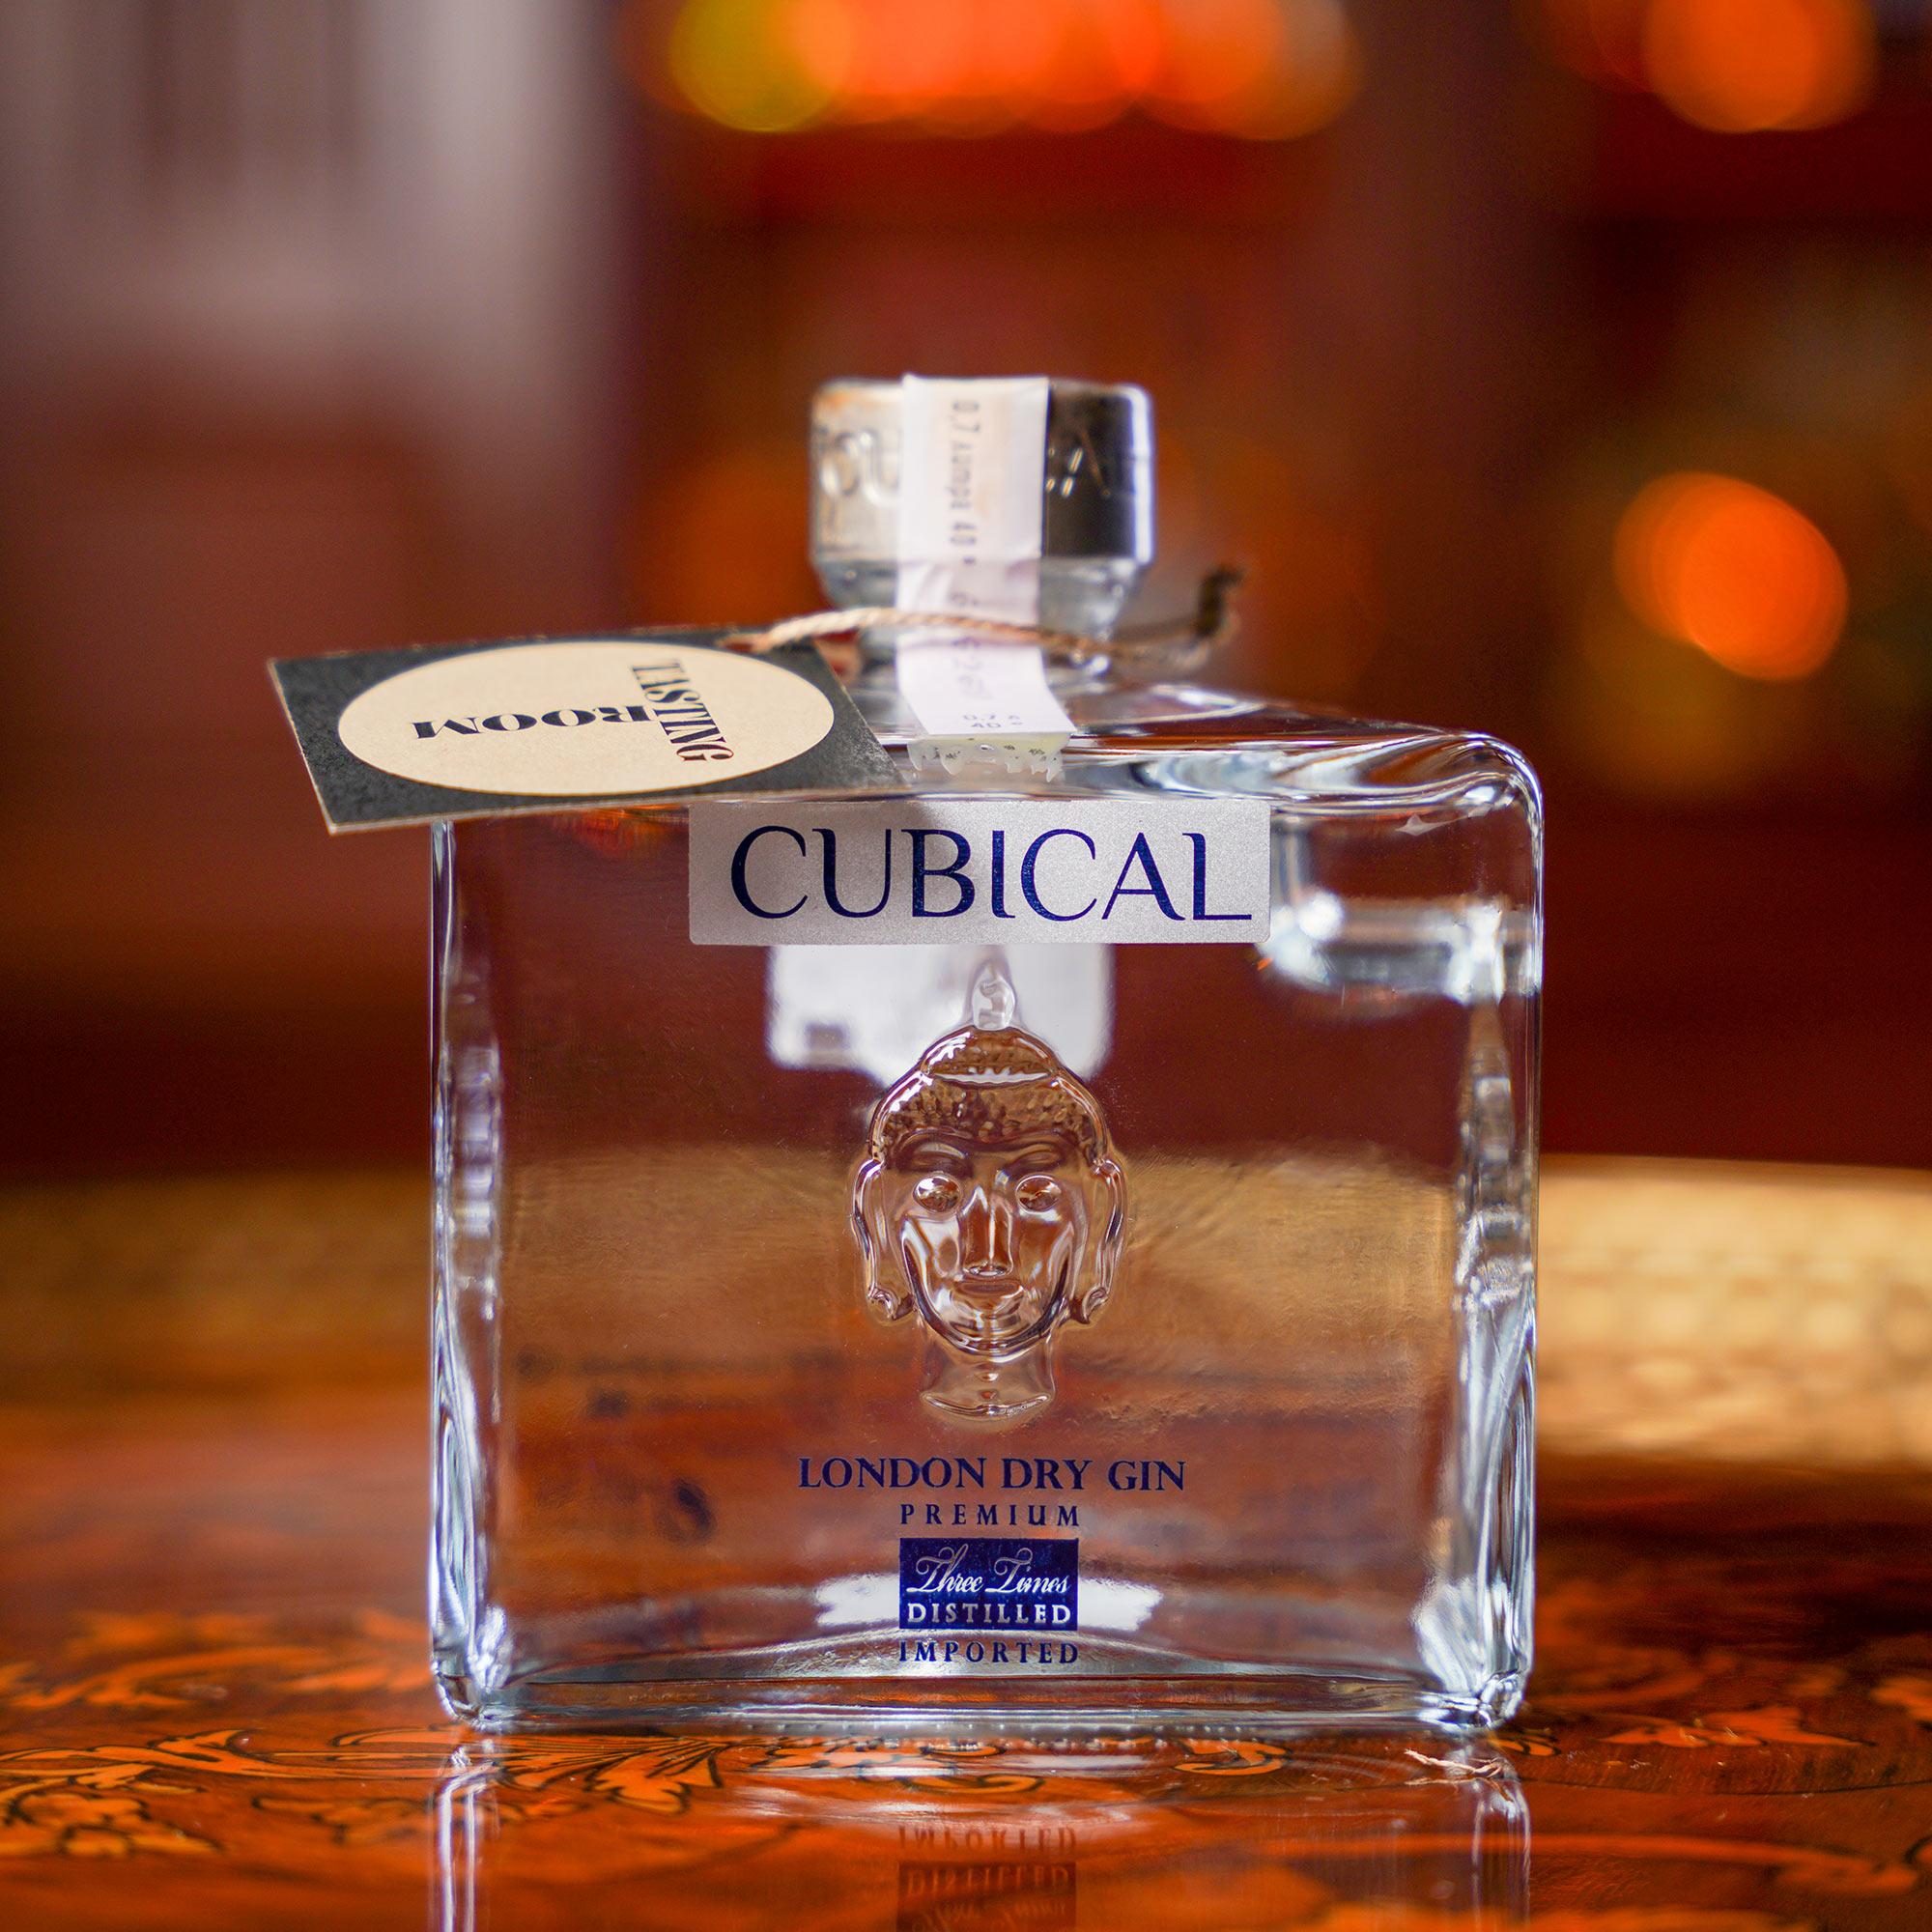 Cubical London Dry Gin Premium /Кюбикъл Лондон Драй Джин Примиум